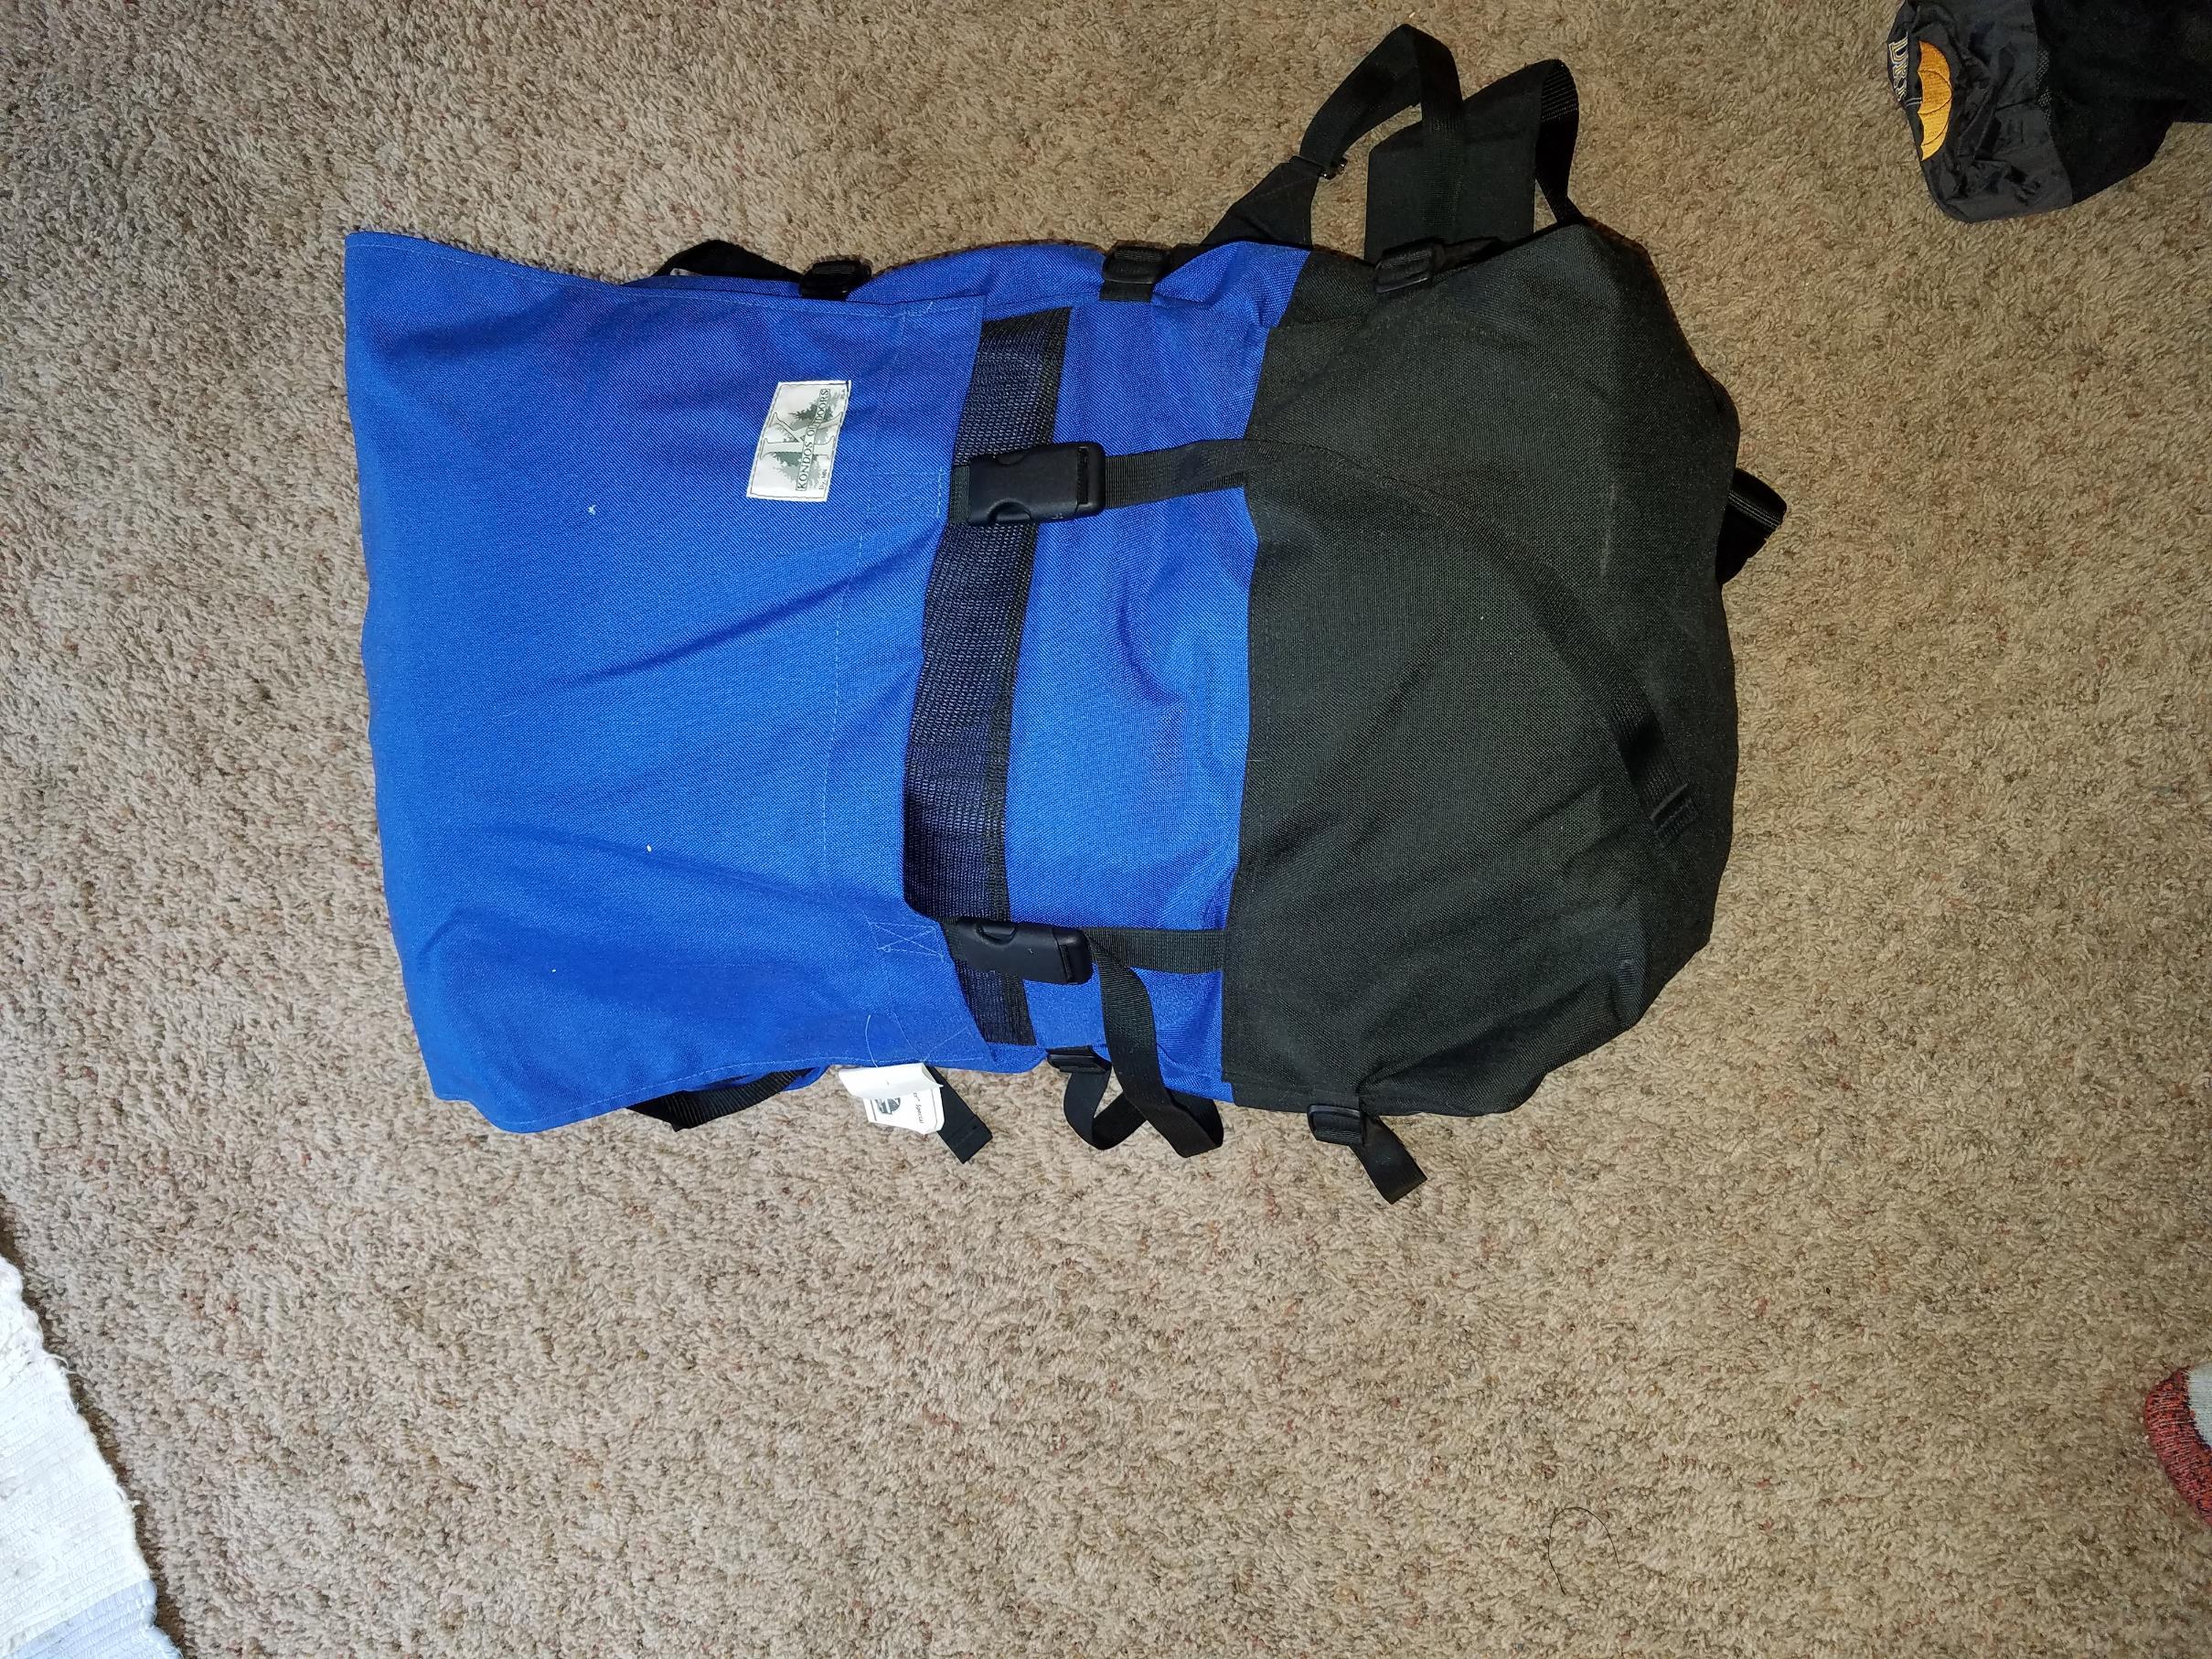 Konos pack